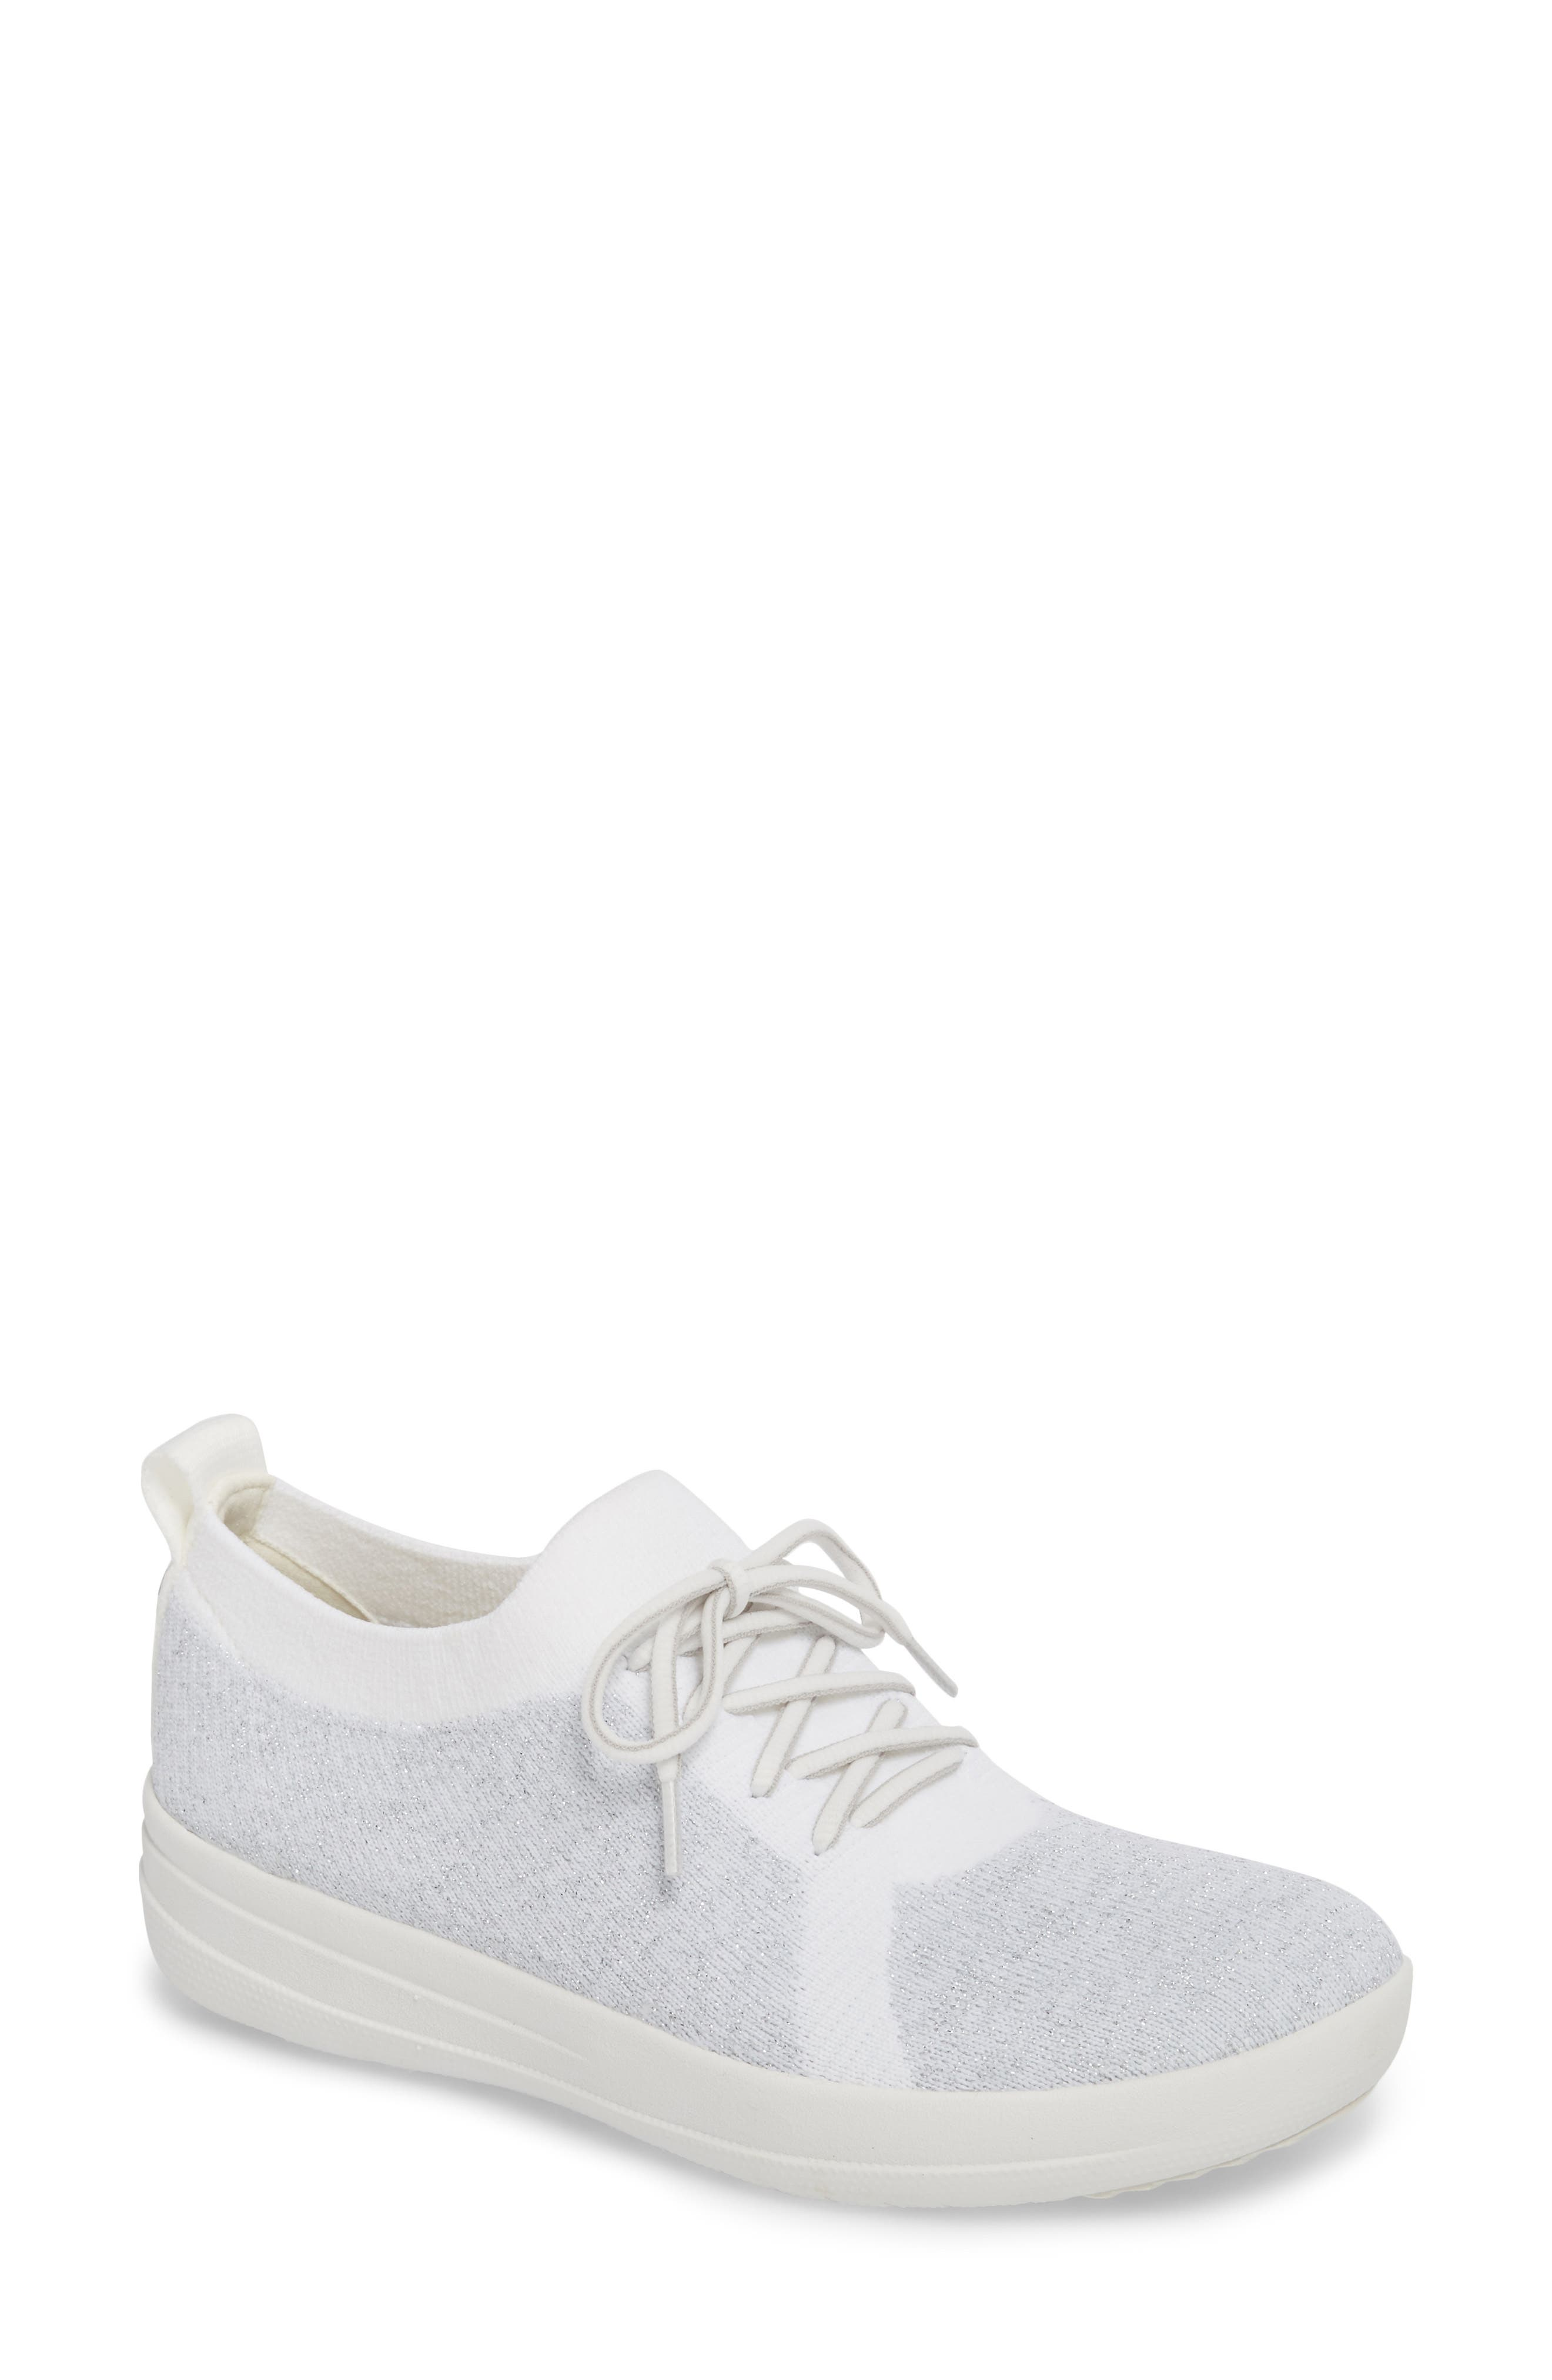 FITFLOP Uberknit<sup>™</sup> F-Sporty Sneaker, Main, color, METALLIC SILVER/ URBAN WHITE